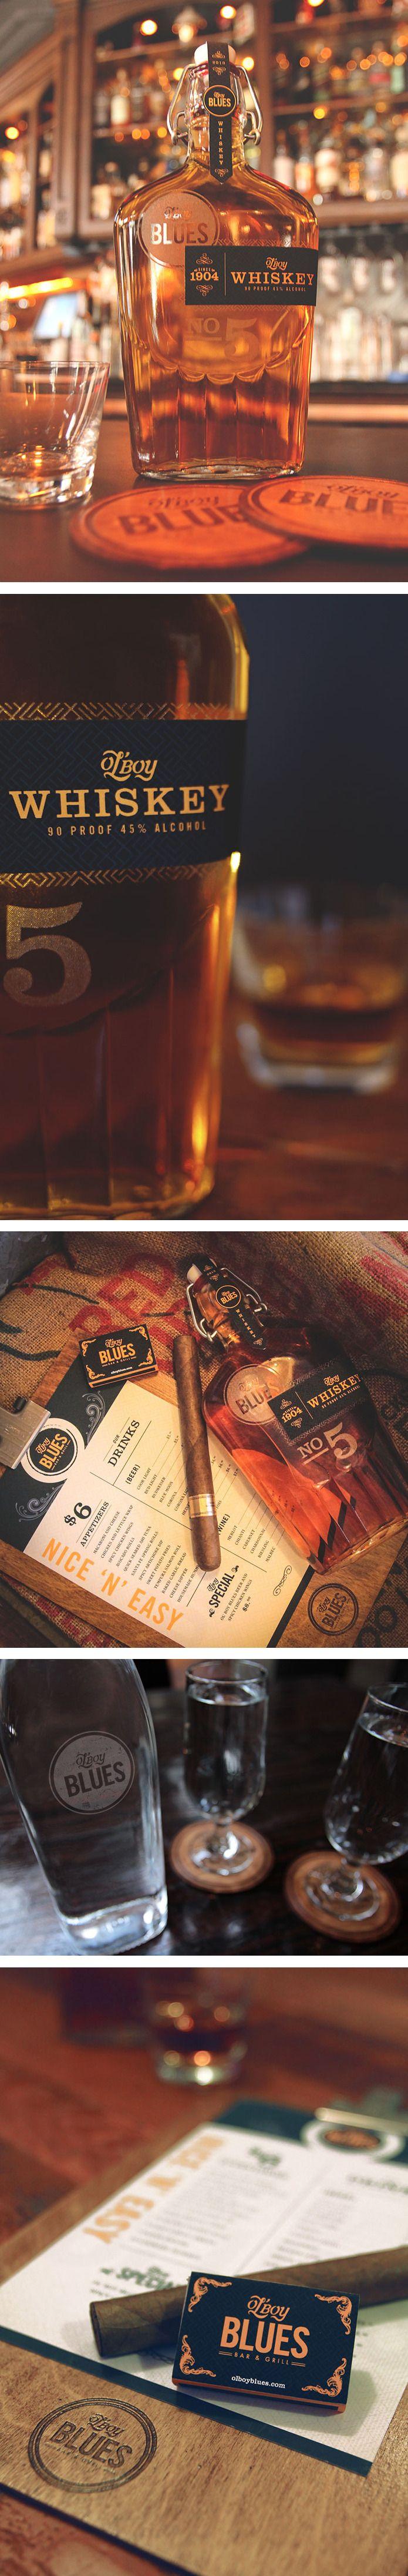 Ol' Boy Blues Whiskey bottle and branding PD